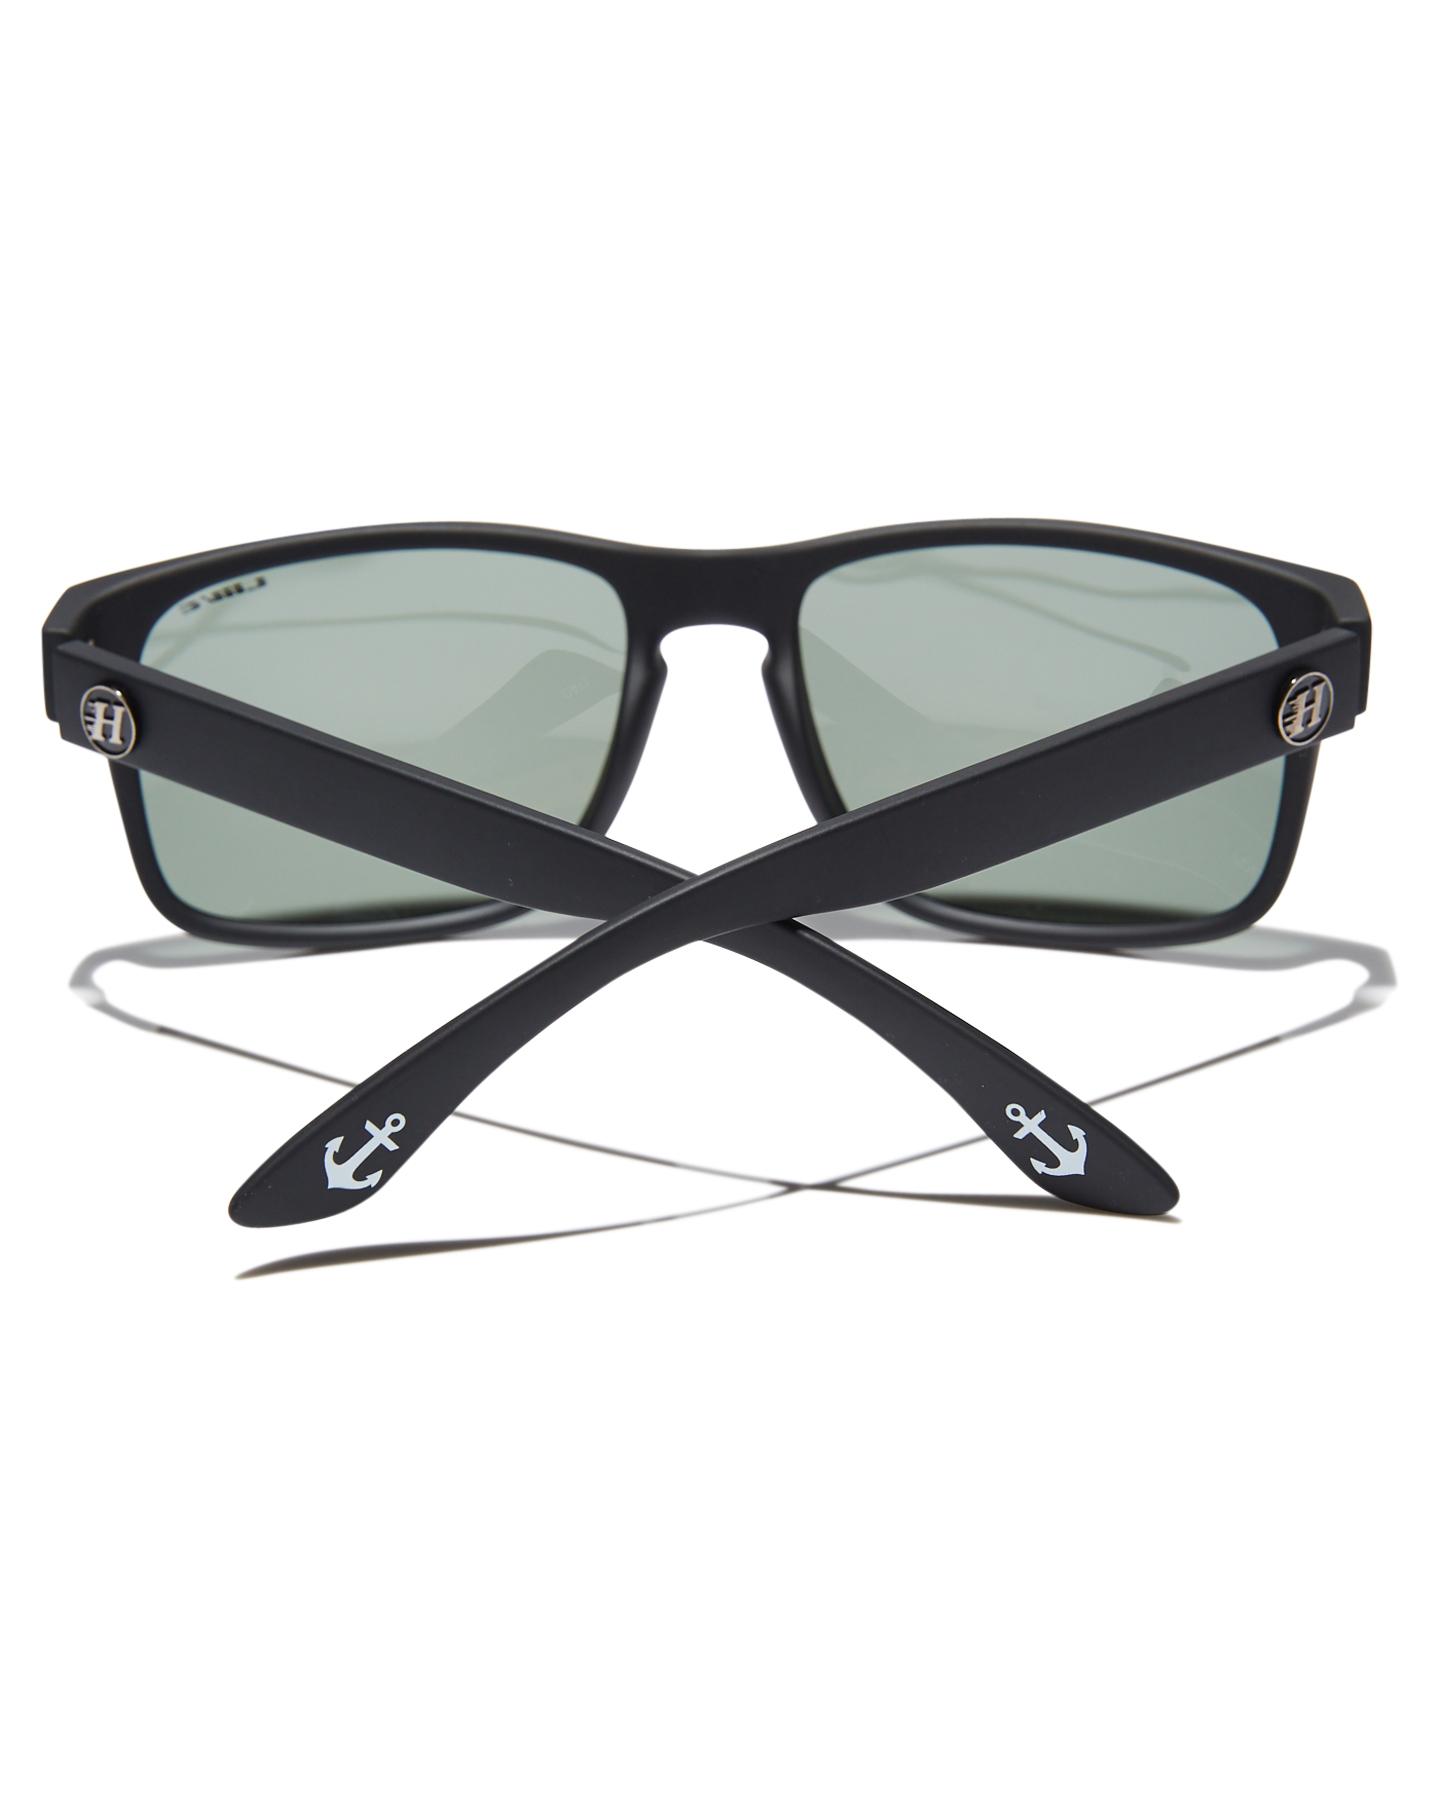 de26456d17 New Liive Vision Men s X Mad Hueys The Shoey Polarised Sunglasses Glass  Black